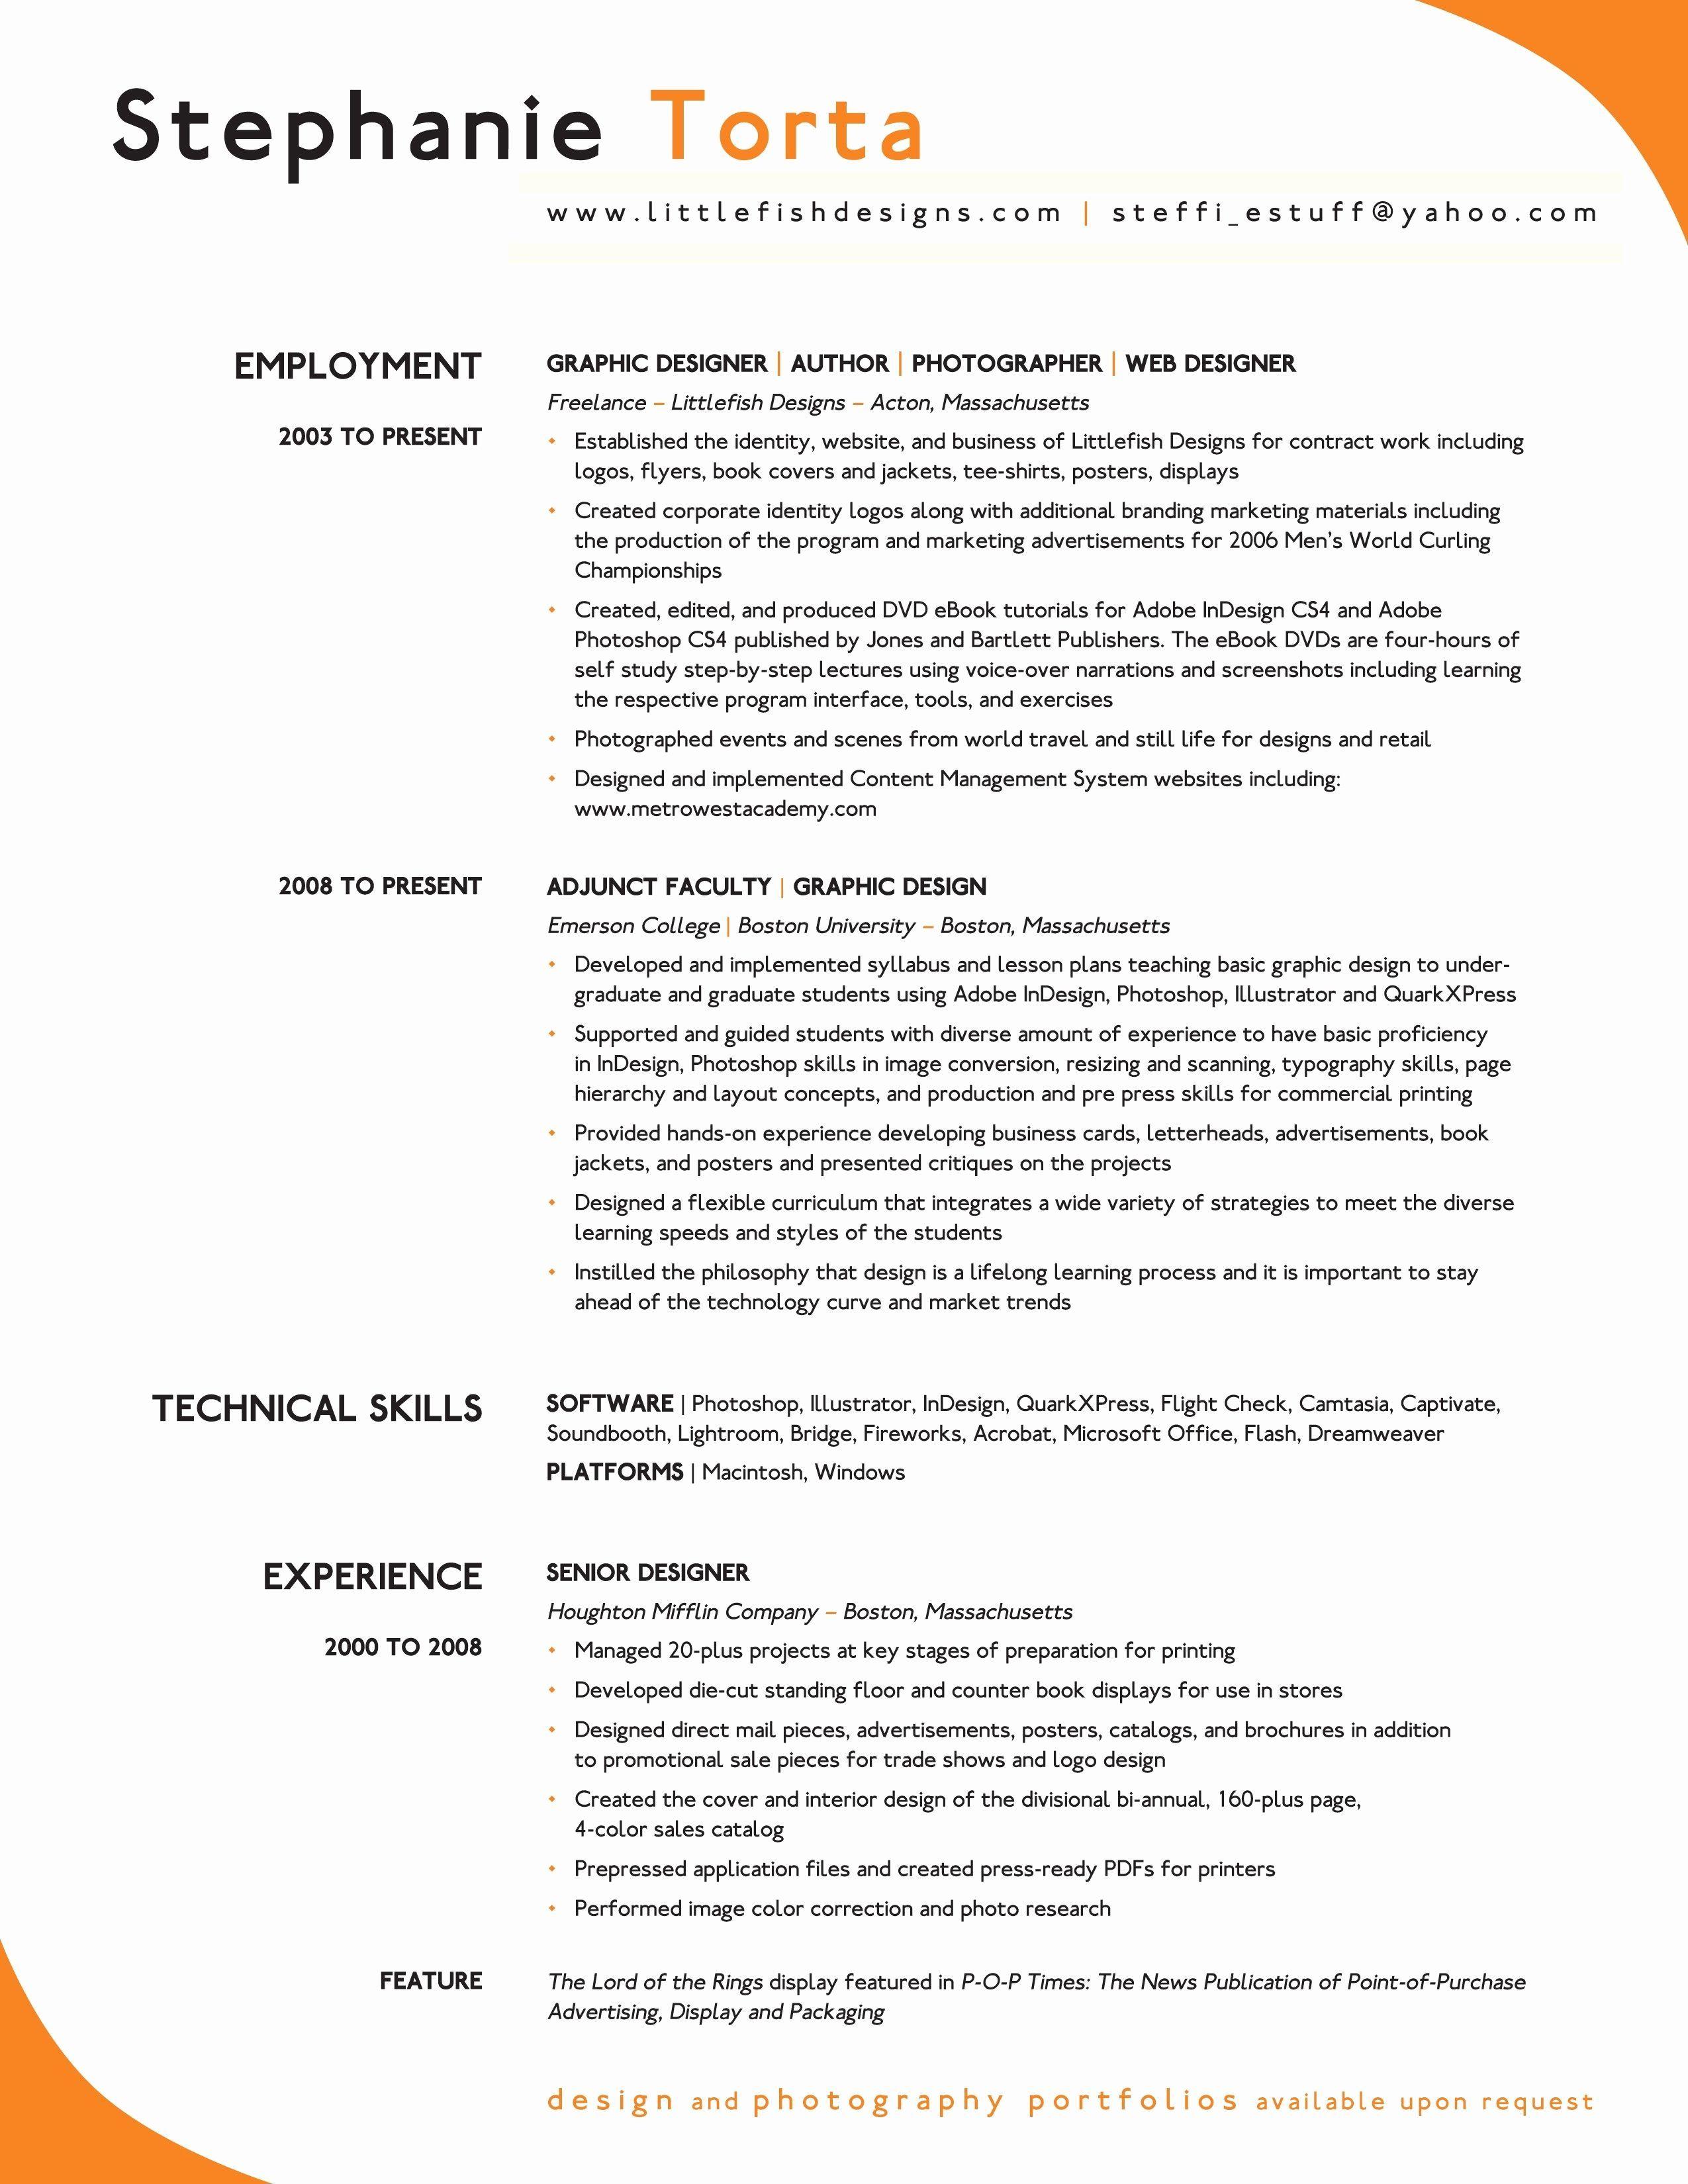 Free Resume Templates Indeed Freeresumetemplates Indeed Resume Templates Resumetemplates Good Cv Resume Template Word Resume Template Free